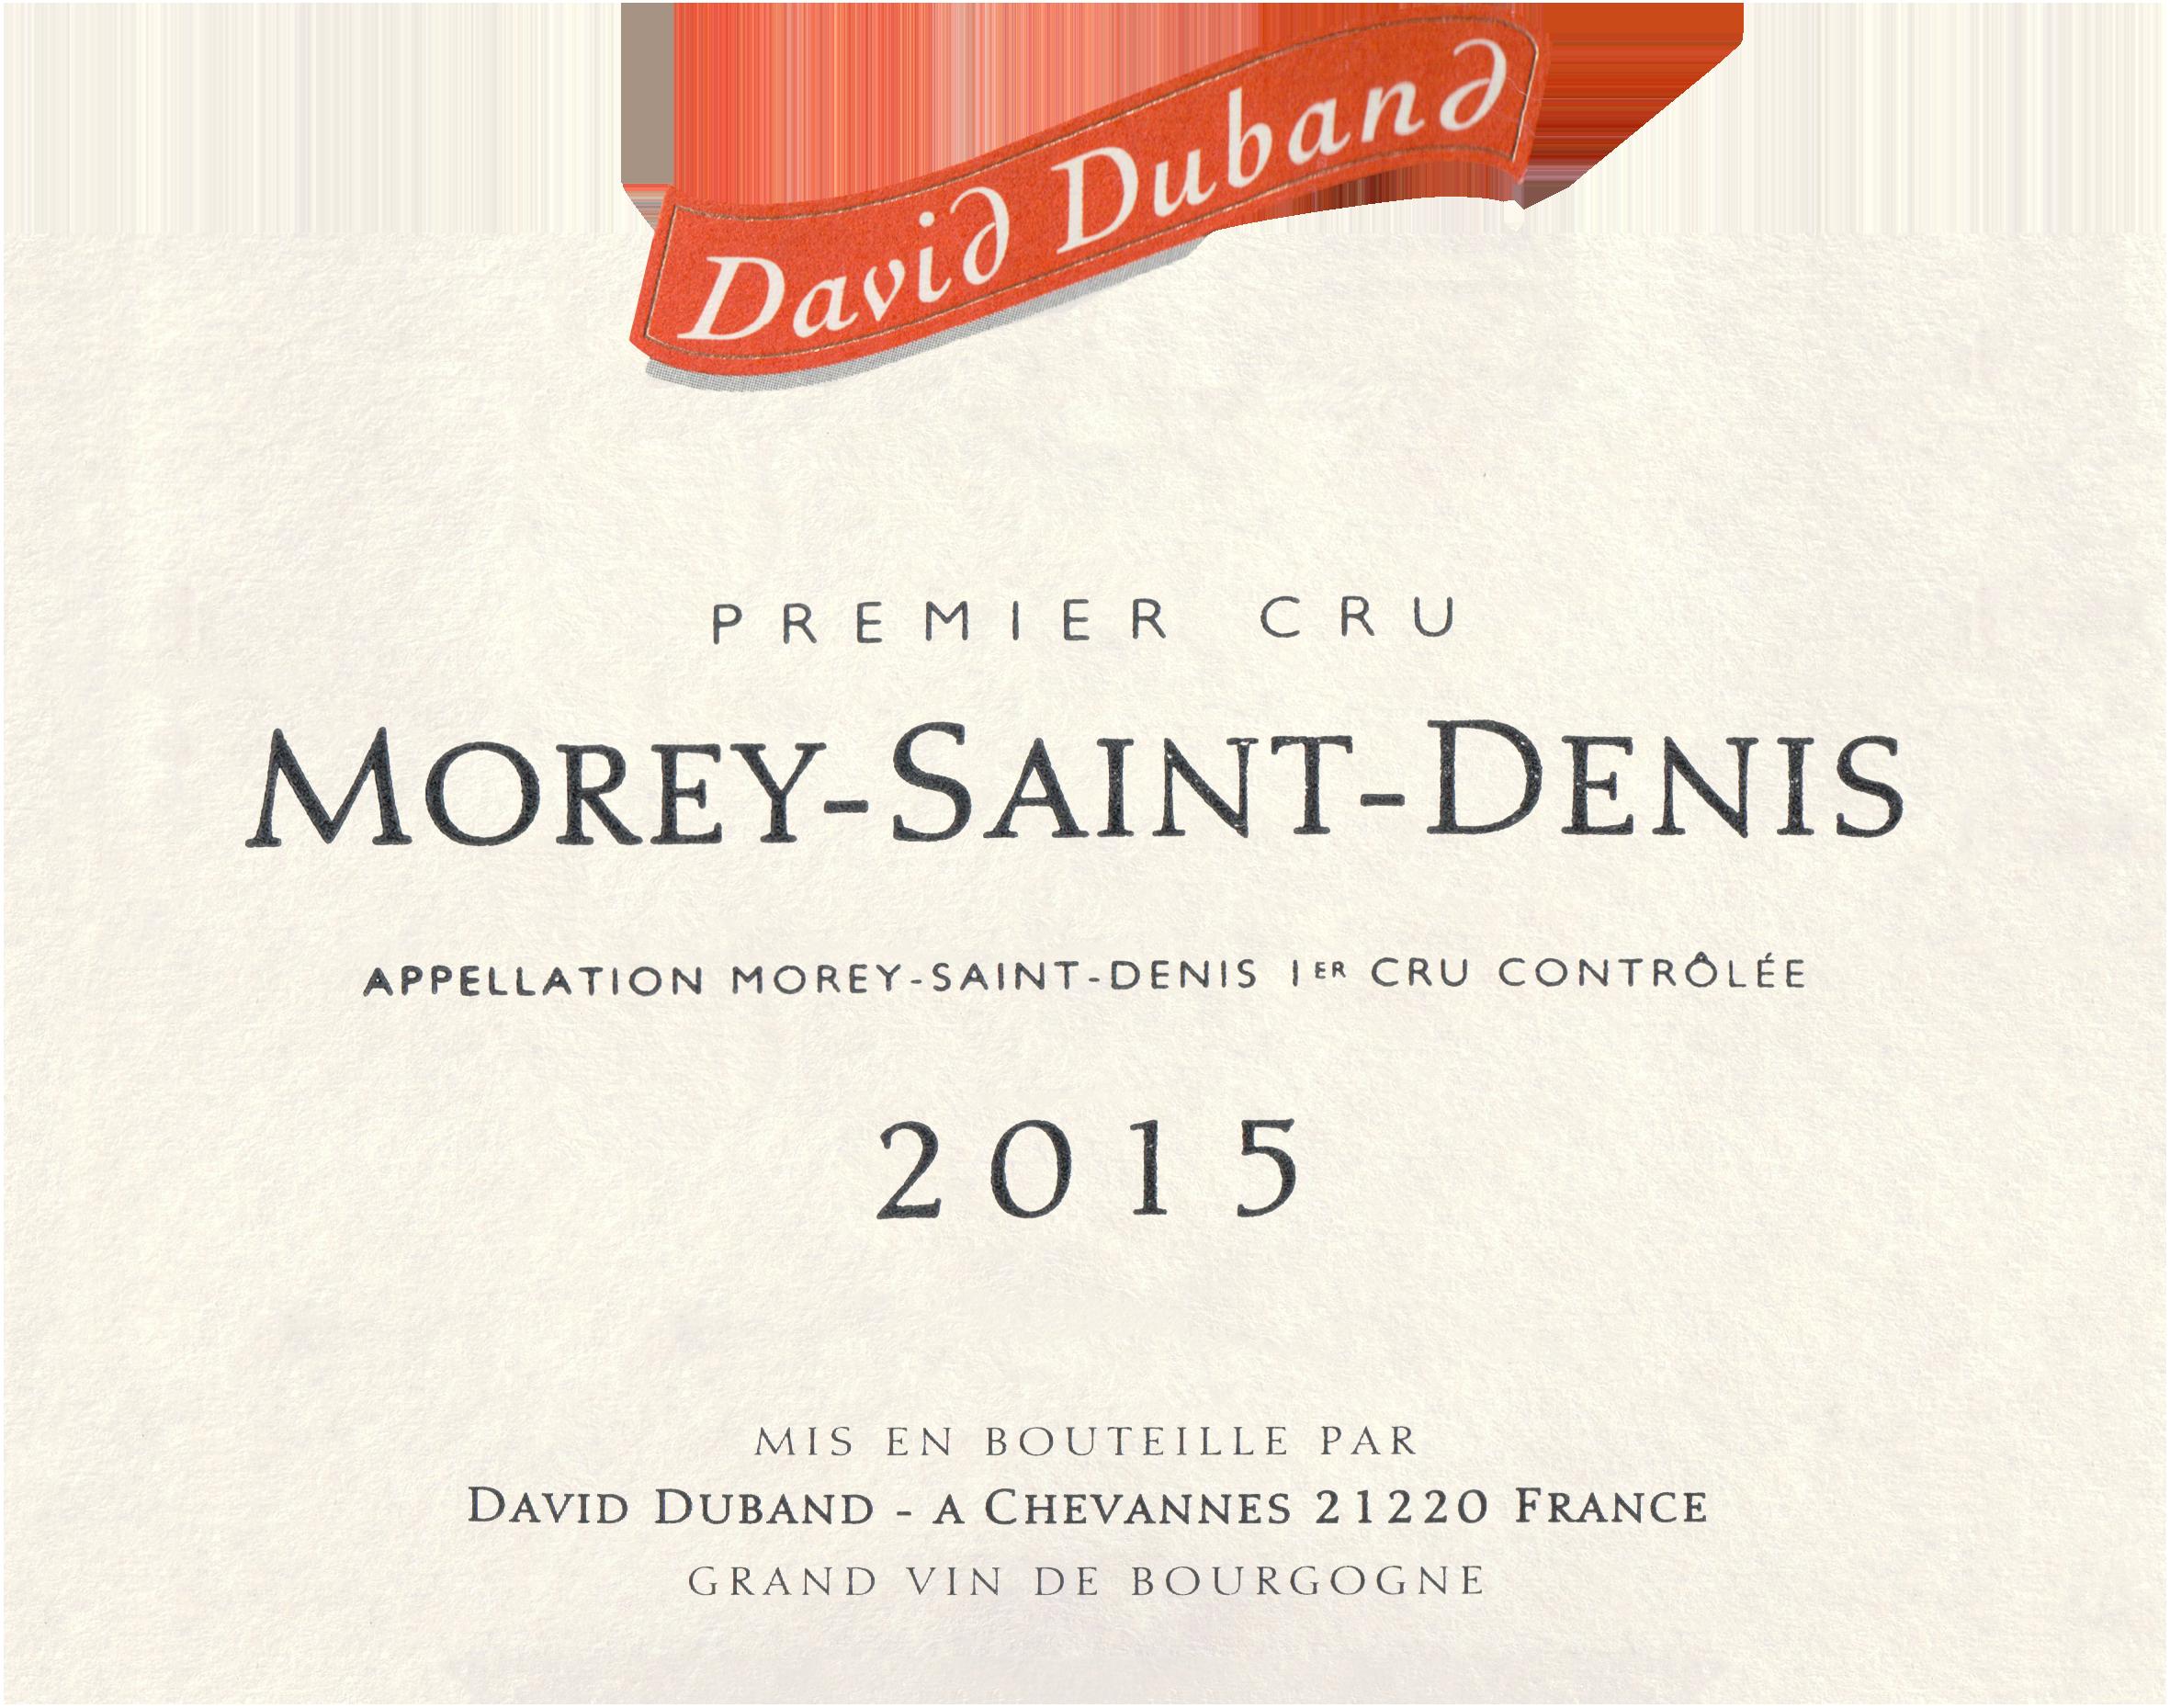 David Duband Morey St Denis 1er Cru 2015